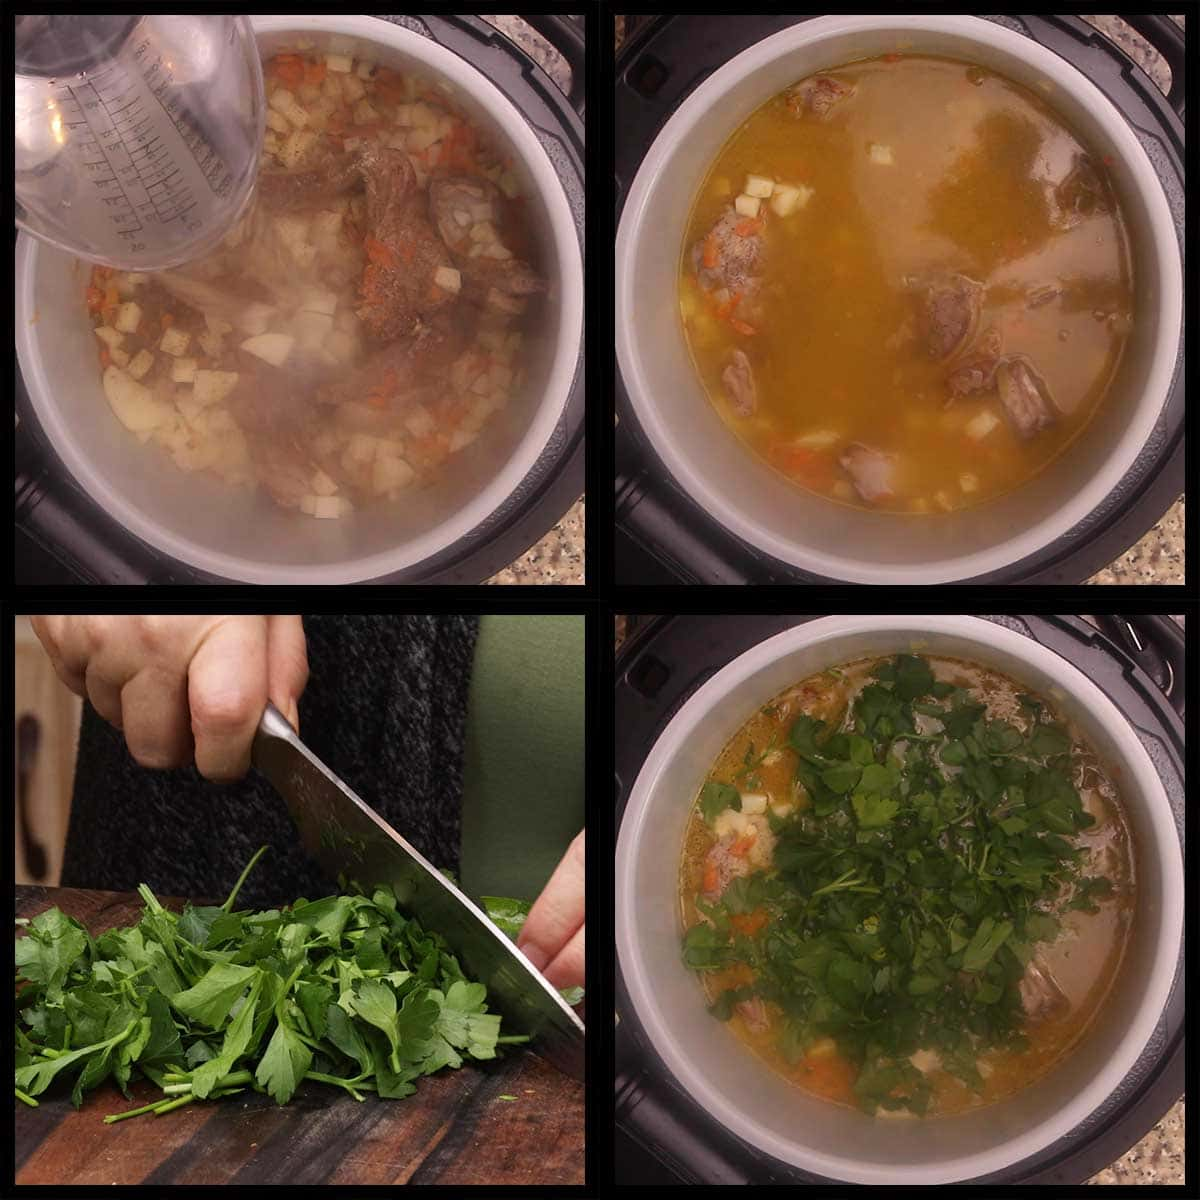 deglazing the pot and adding parsley